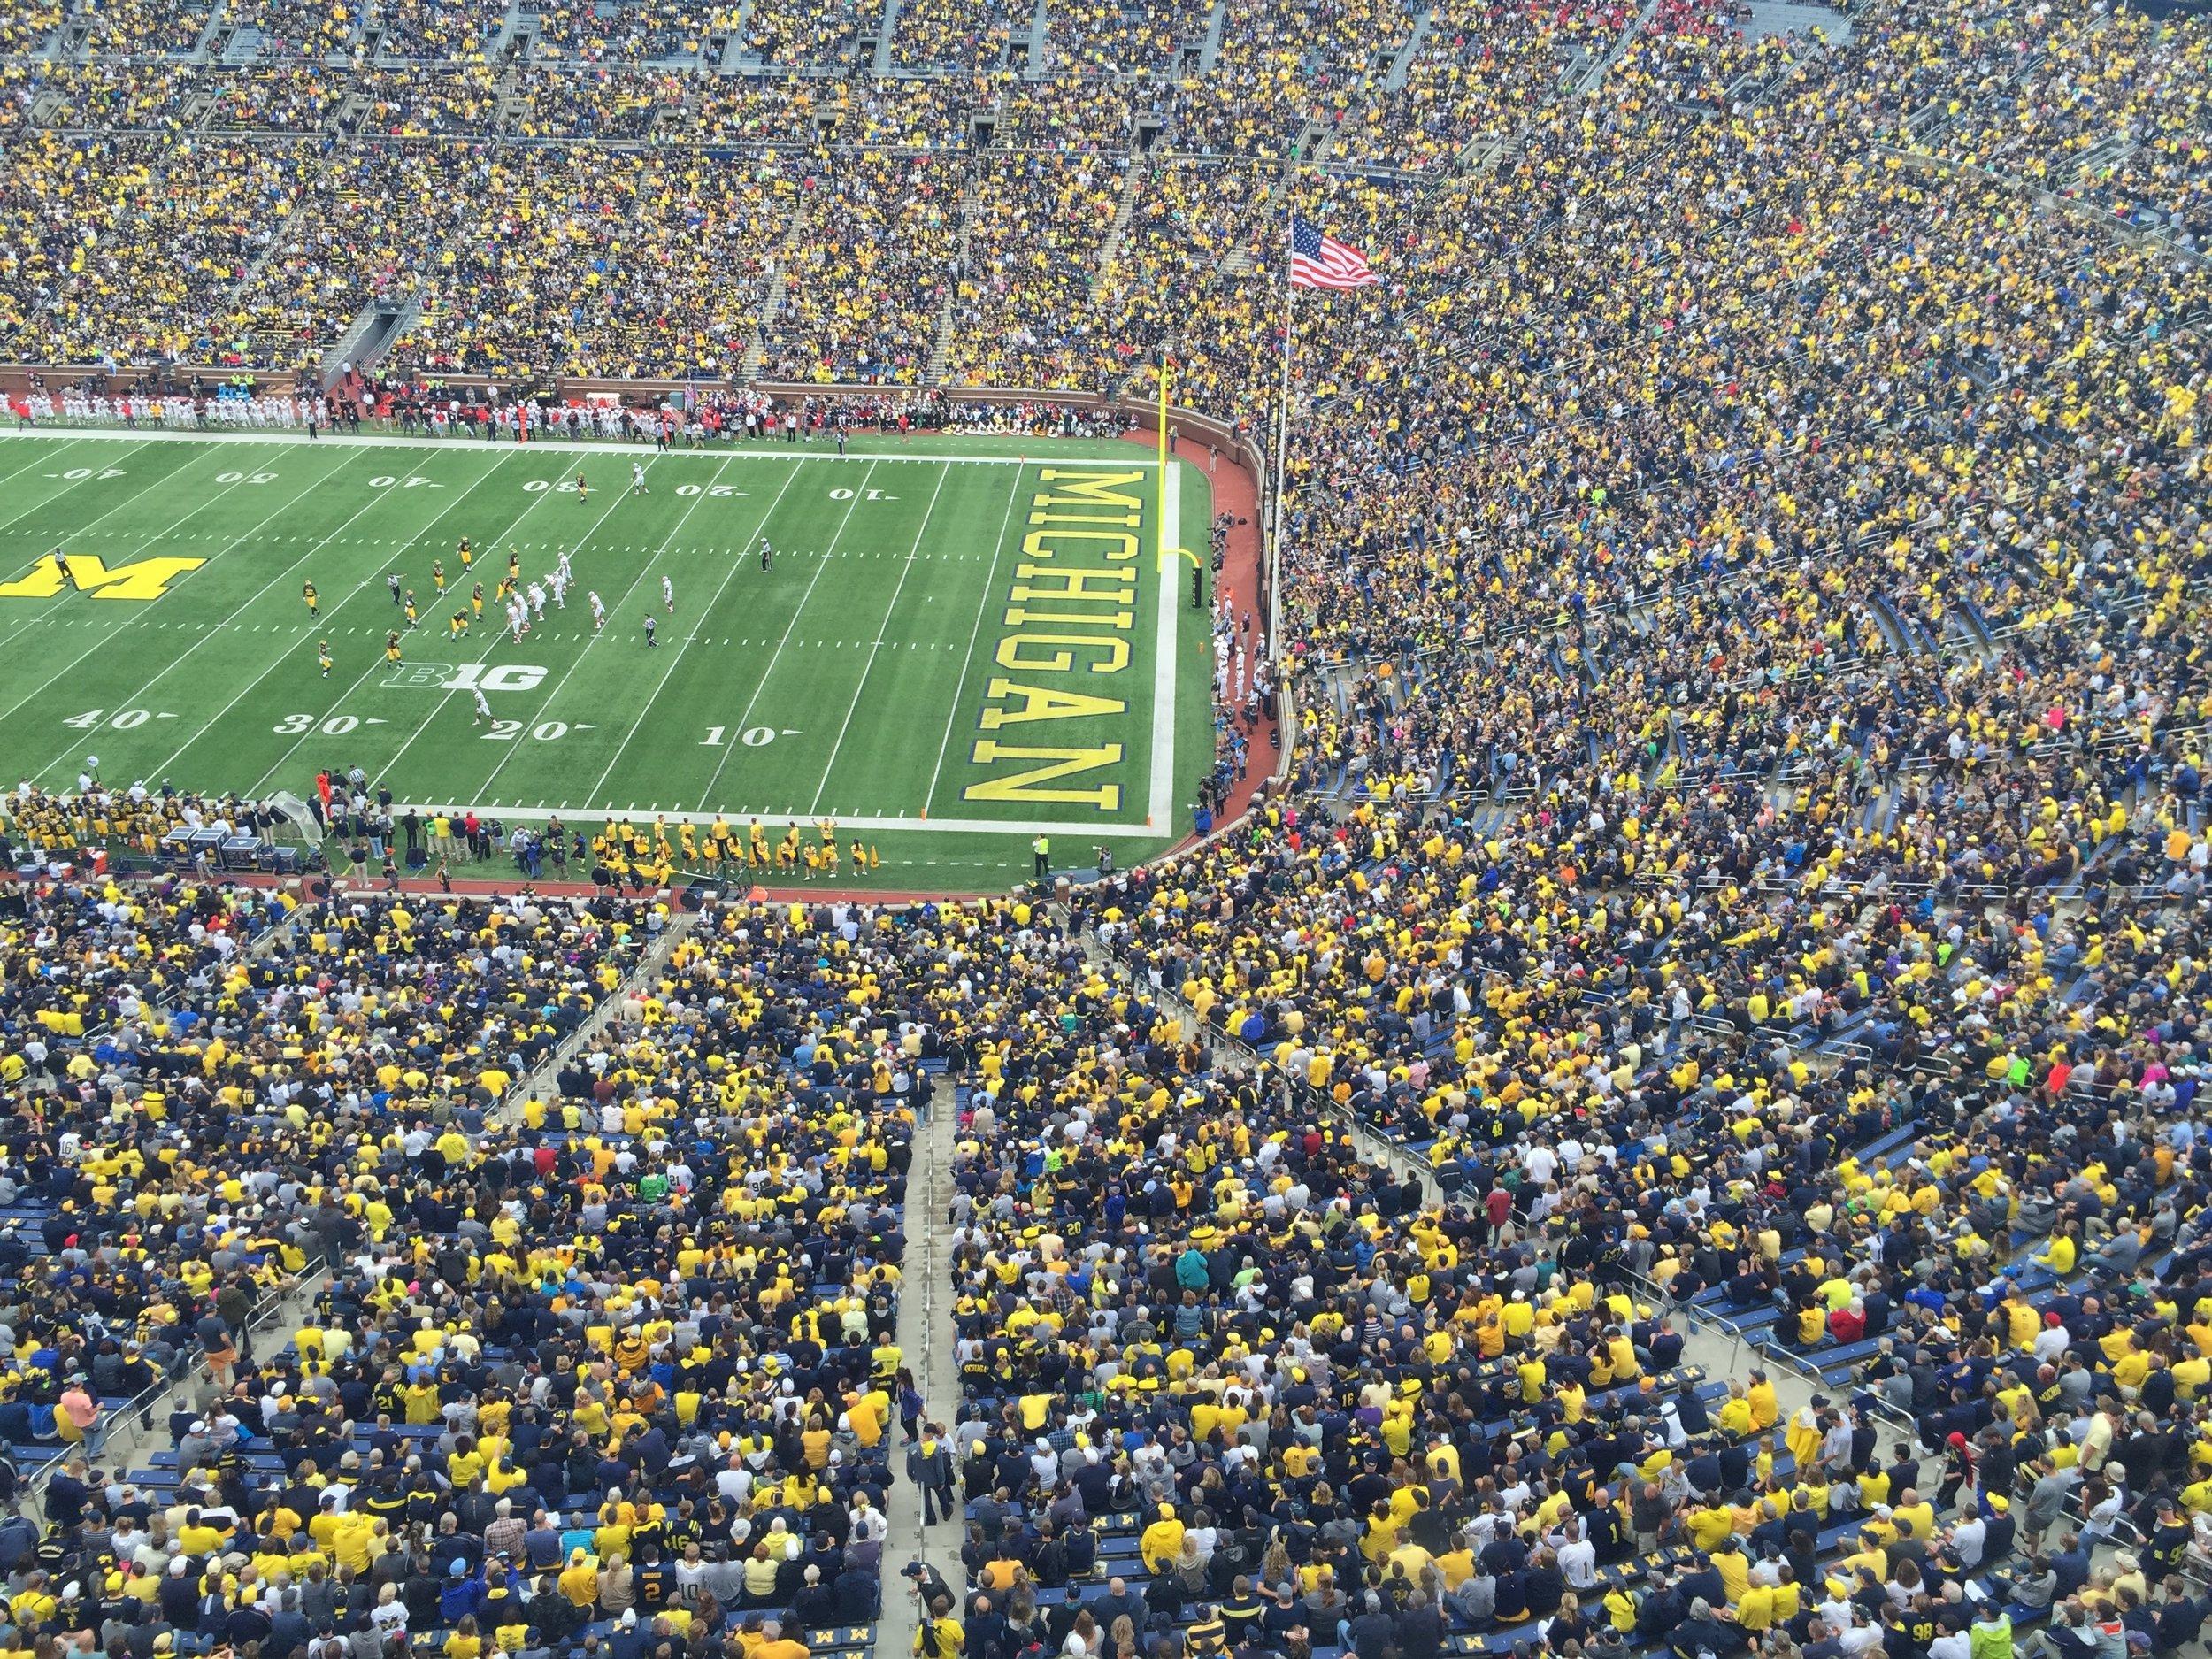 September 19, 2015, Michigan Stadium (Ann Arbor, MI)